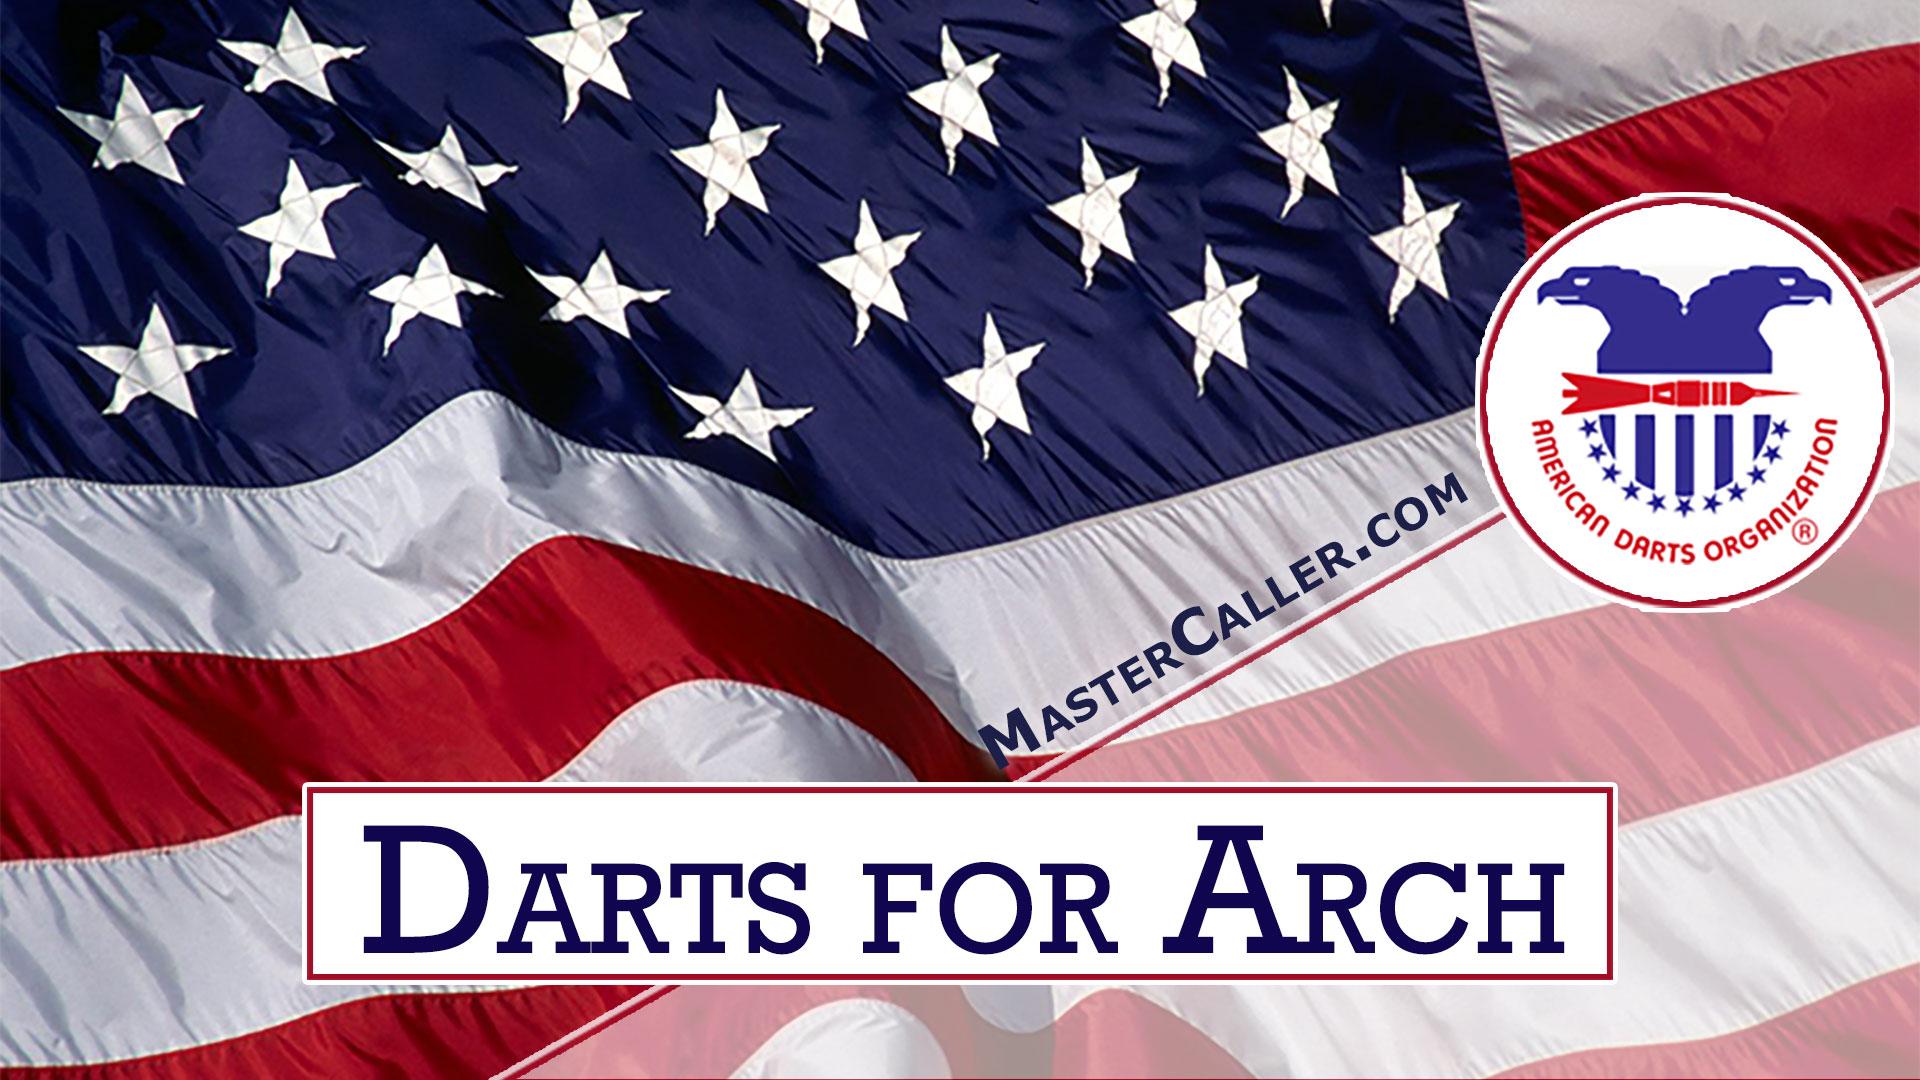 Darts for Arch Girls - 2017 Logo